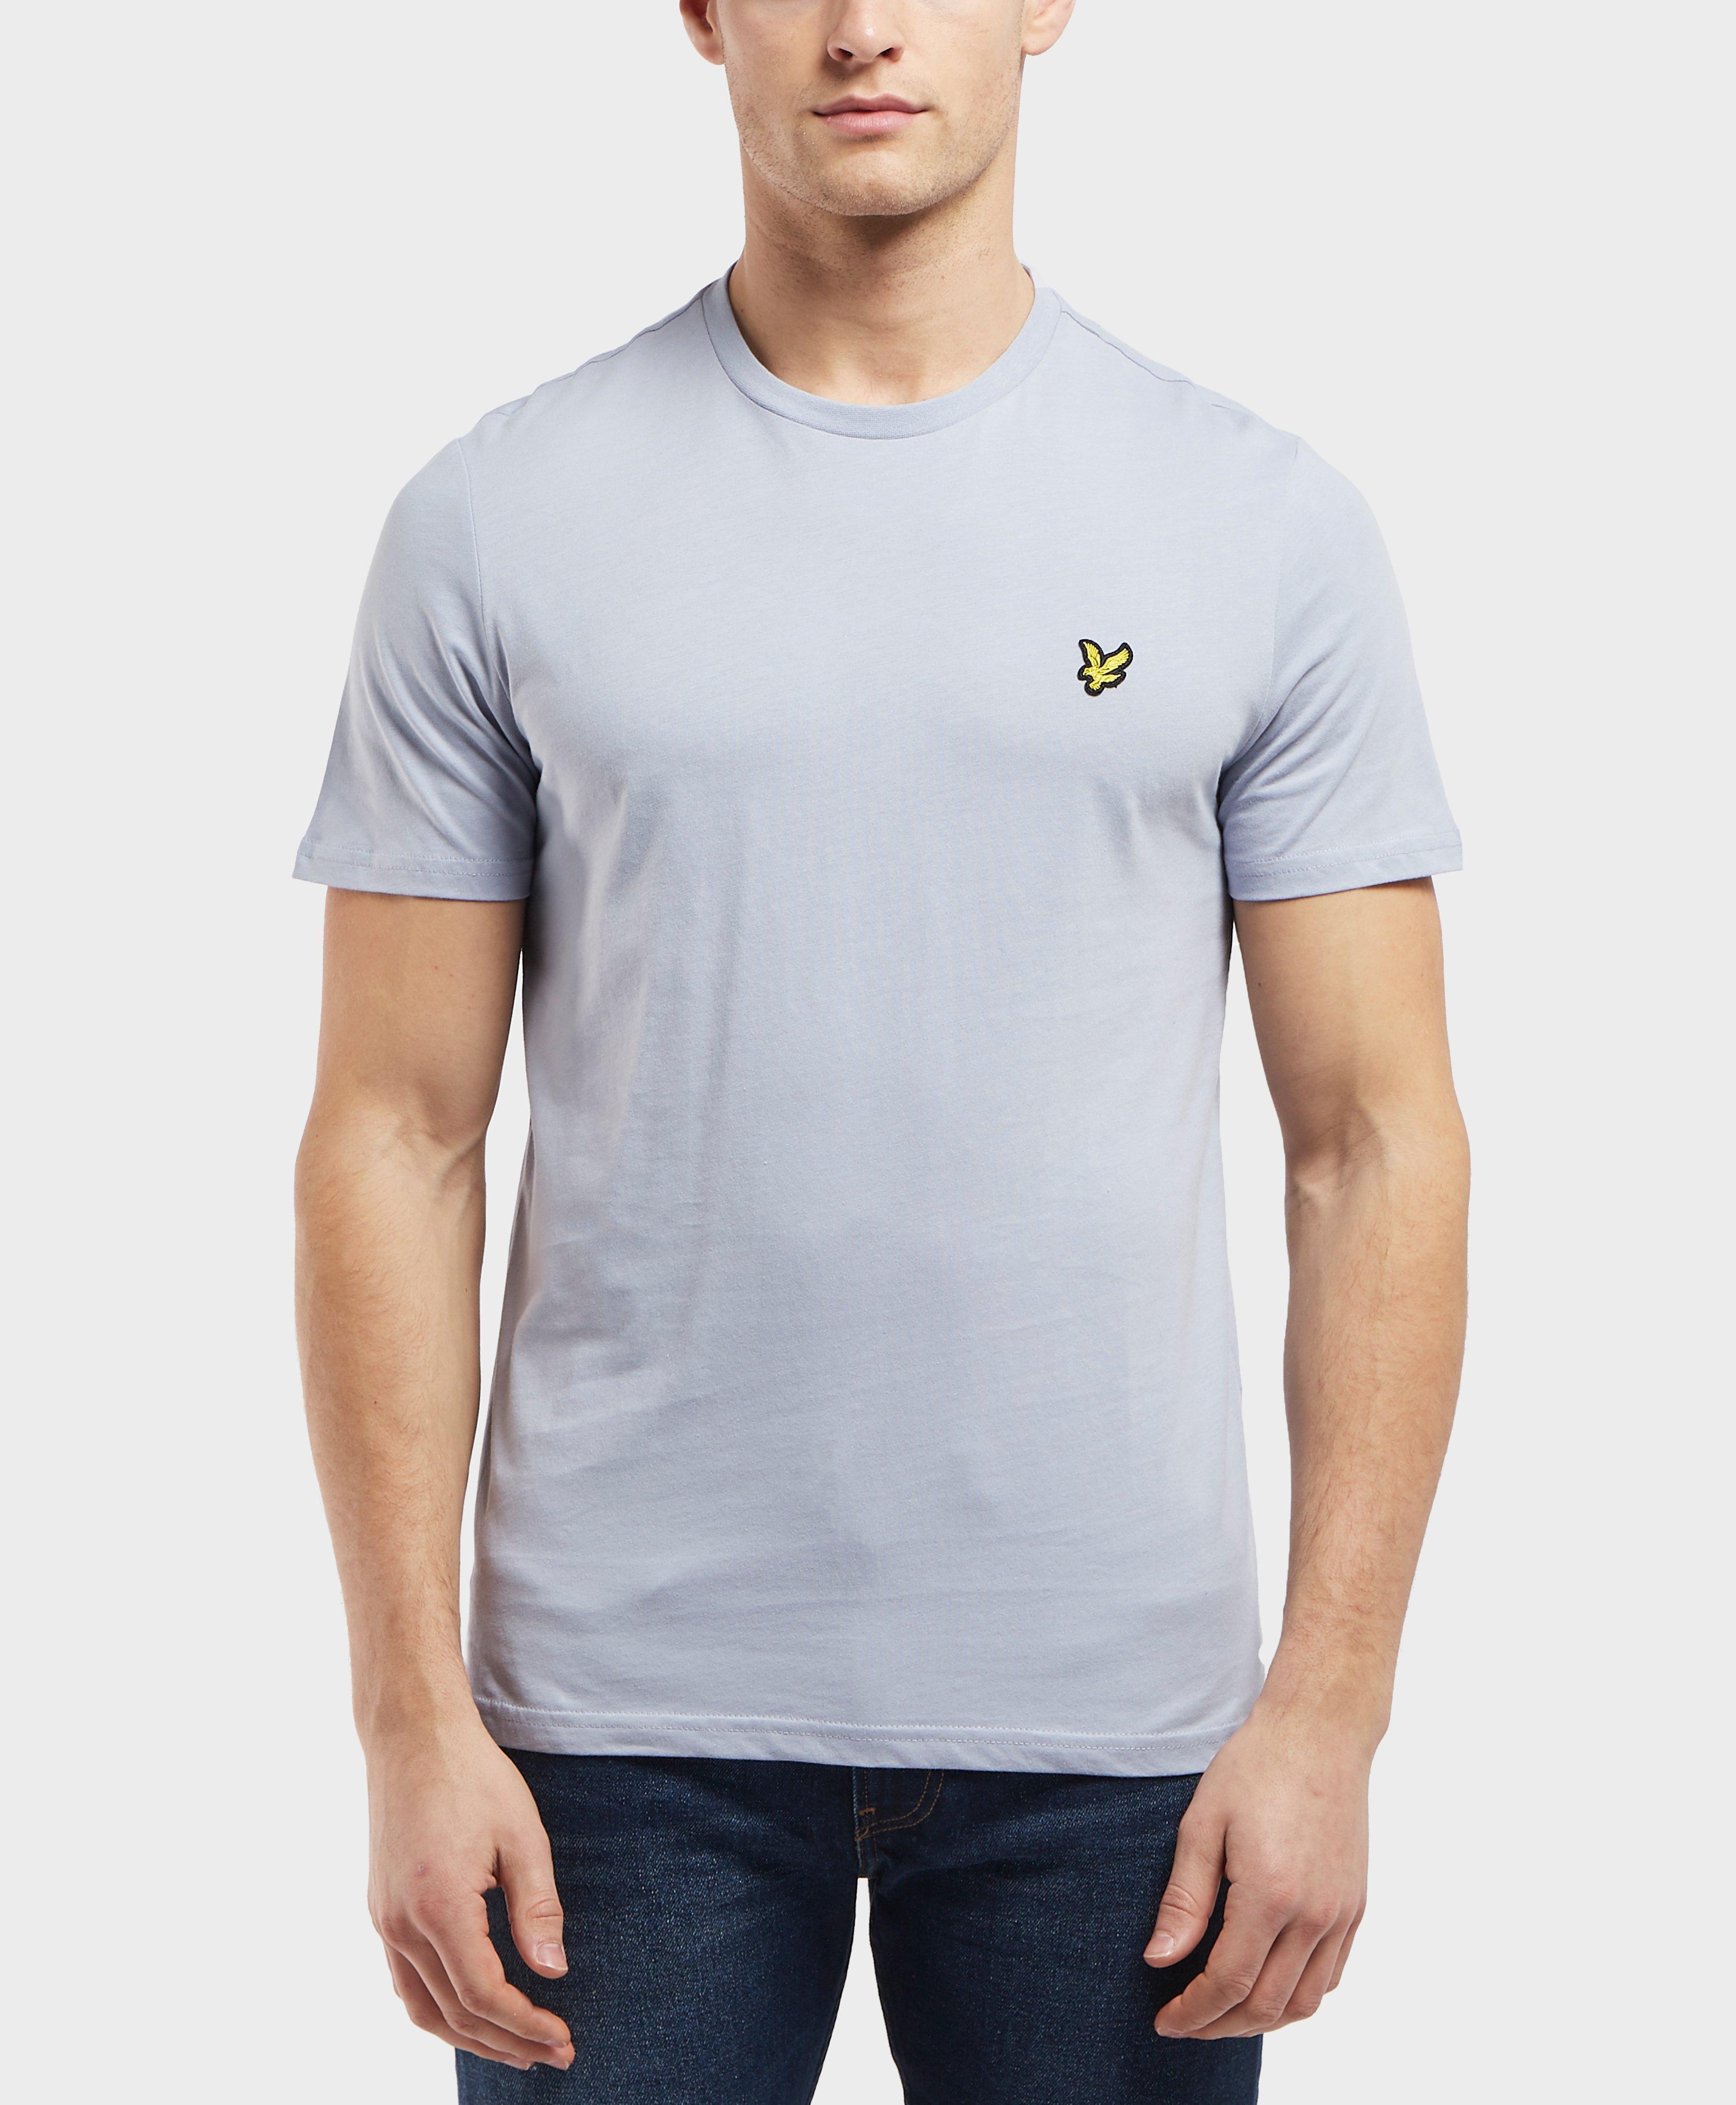 9c339c84a Lyle & Scott Basic Short Sleeve T-shirt for Men - Lyst